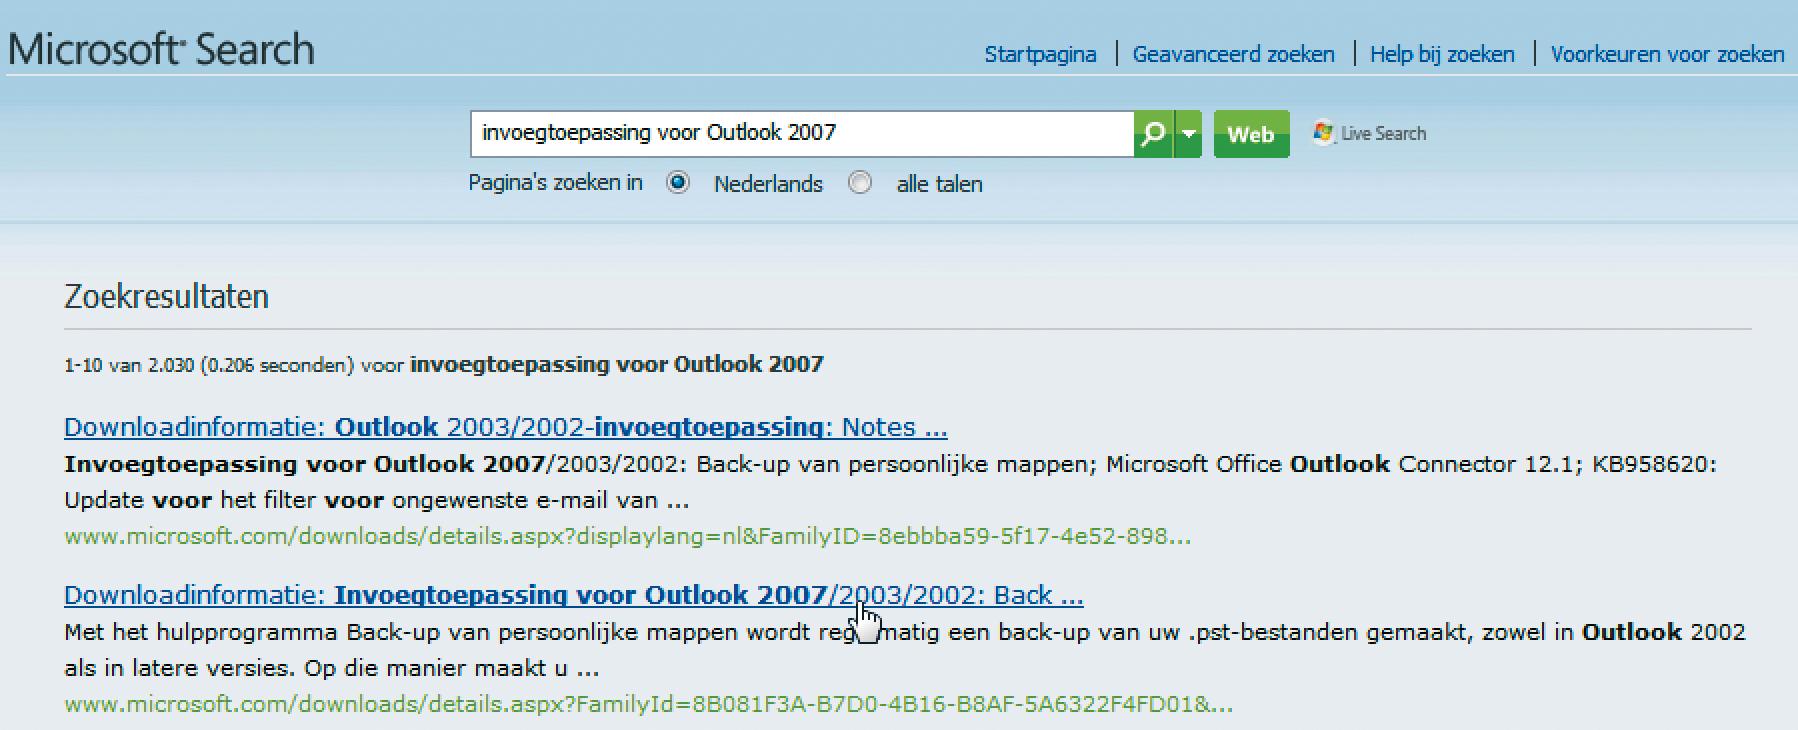 OUTLOOK 2007 PFBACKUP TÉLÉCHARGER